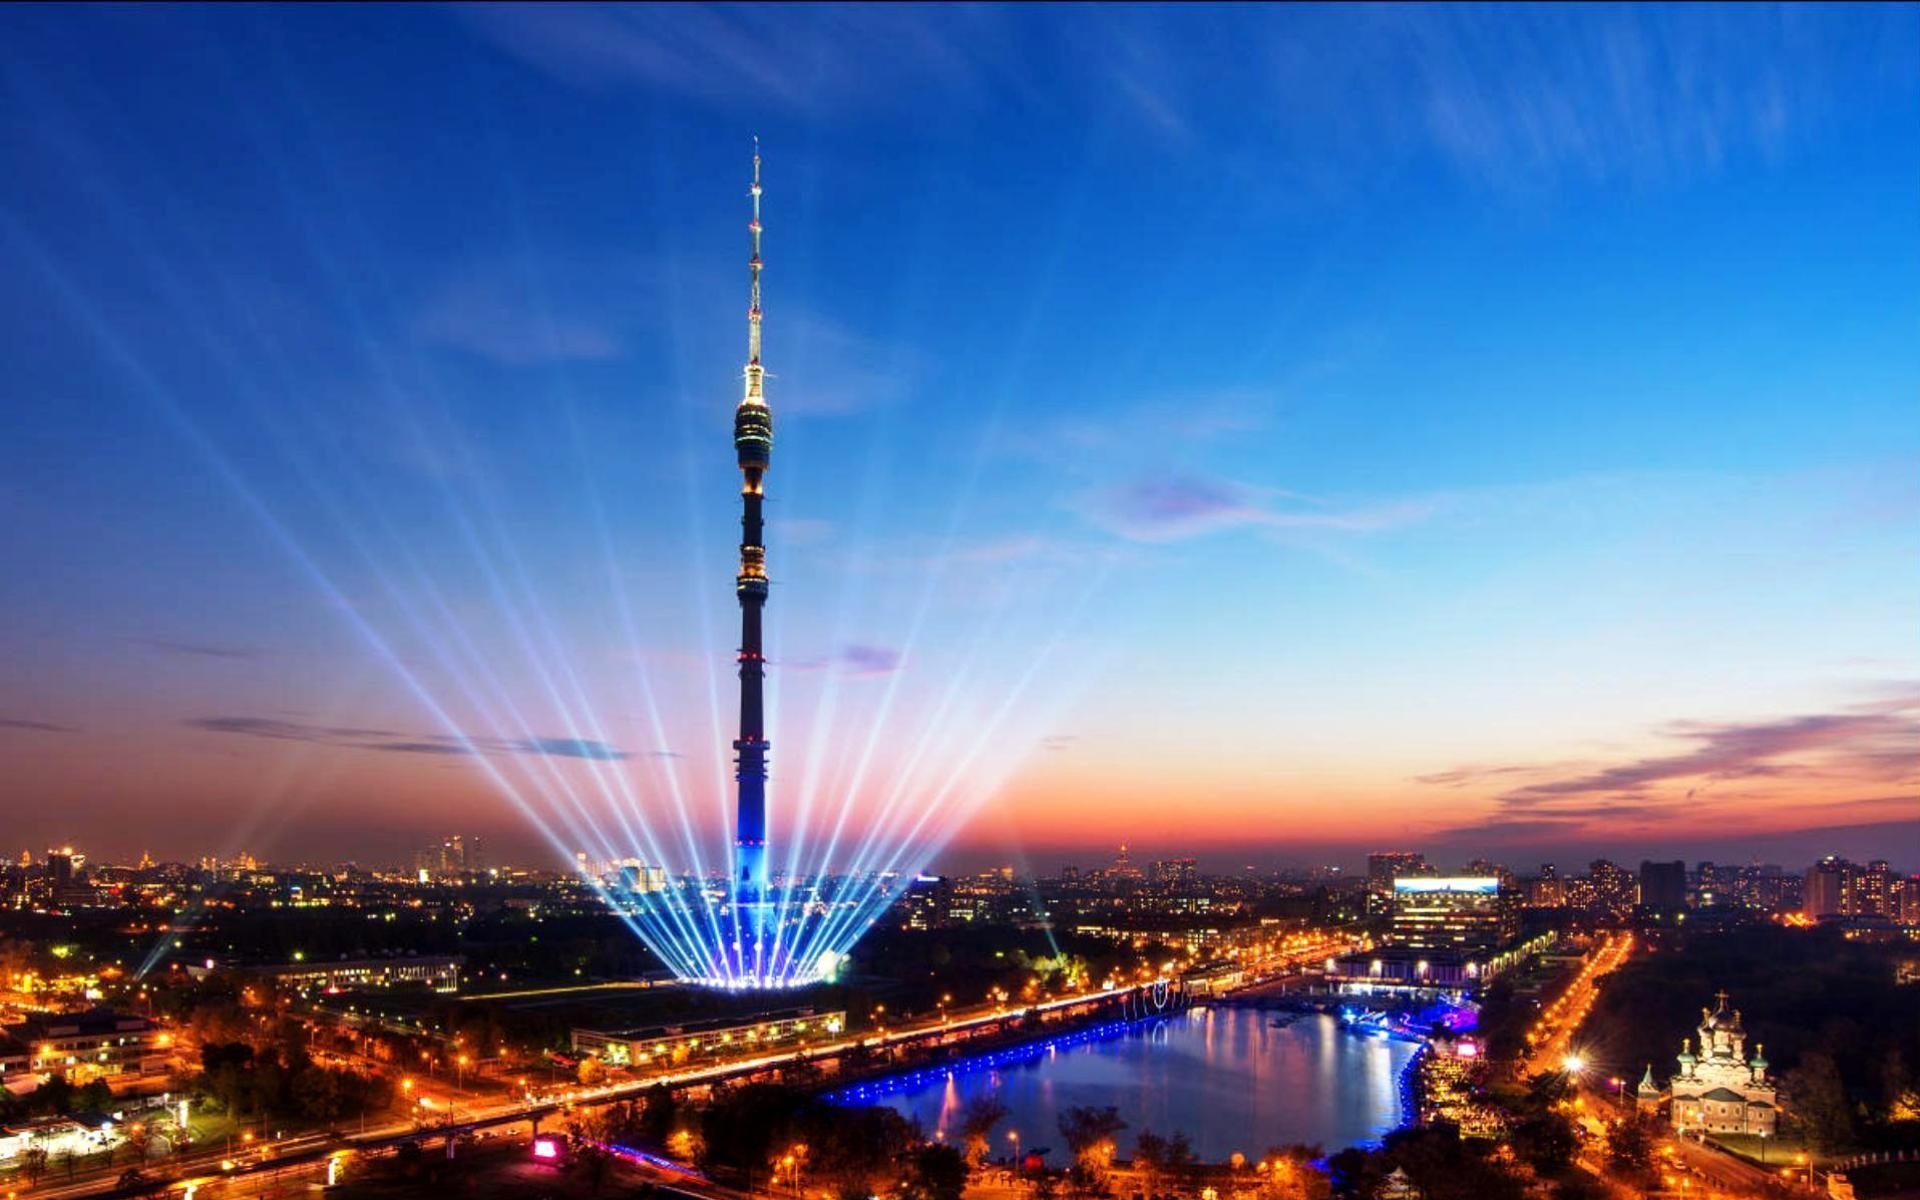 Останкинская телебашня г. Москва. Фото